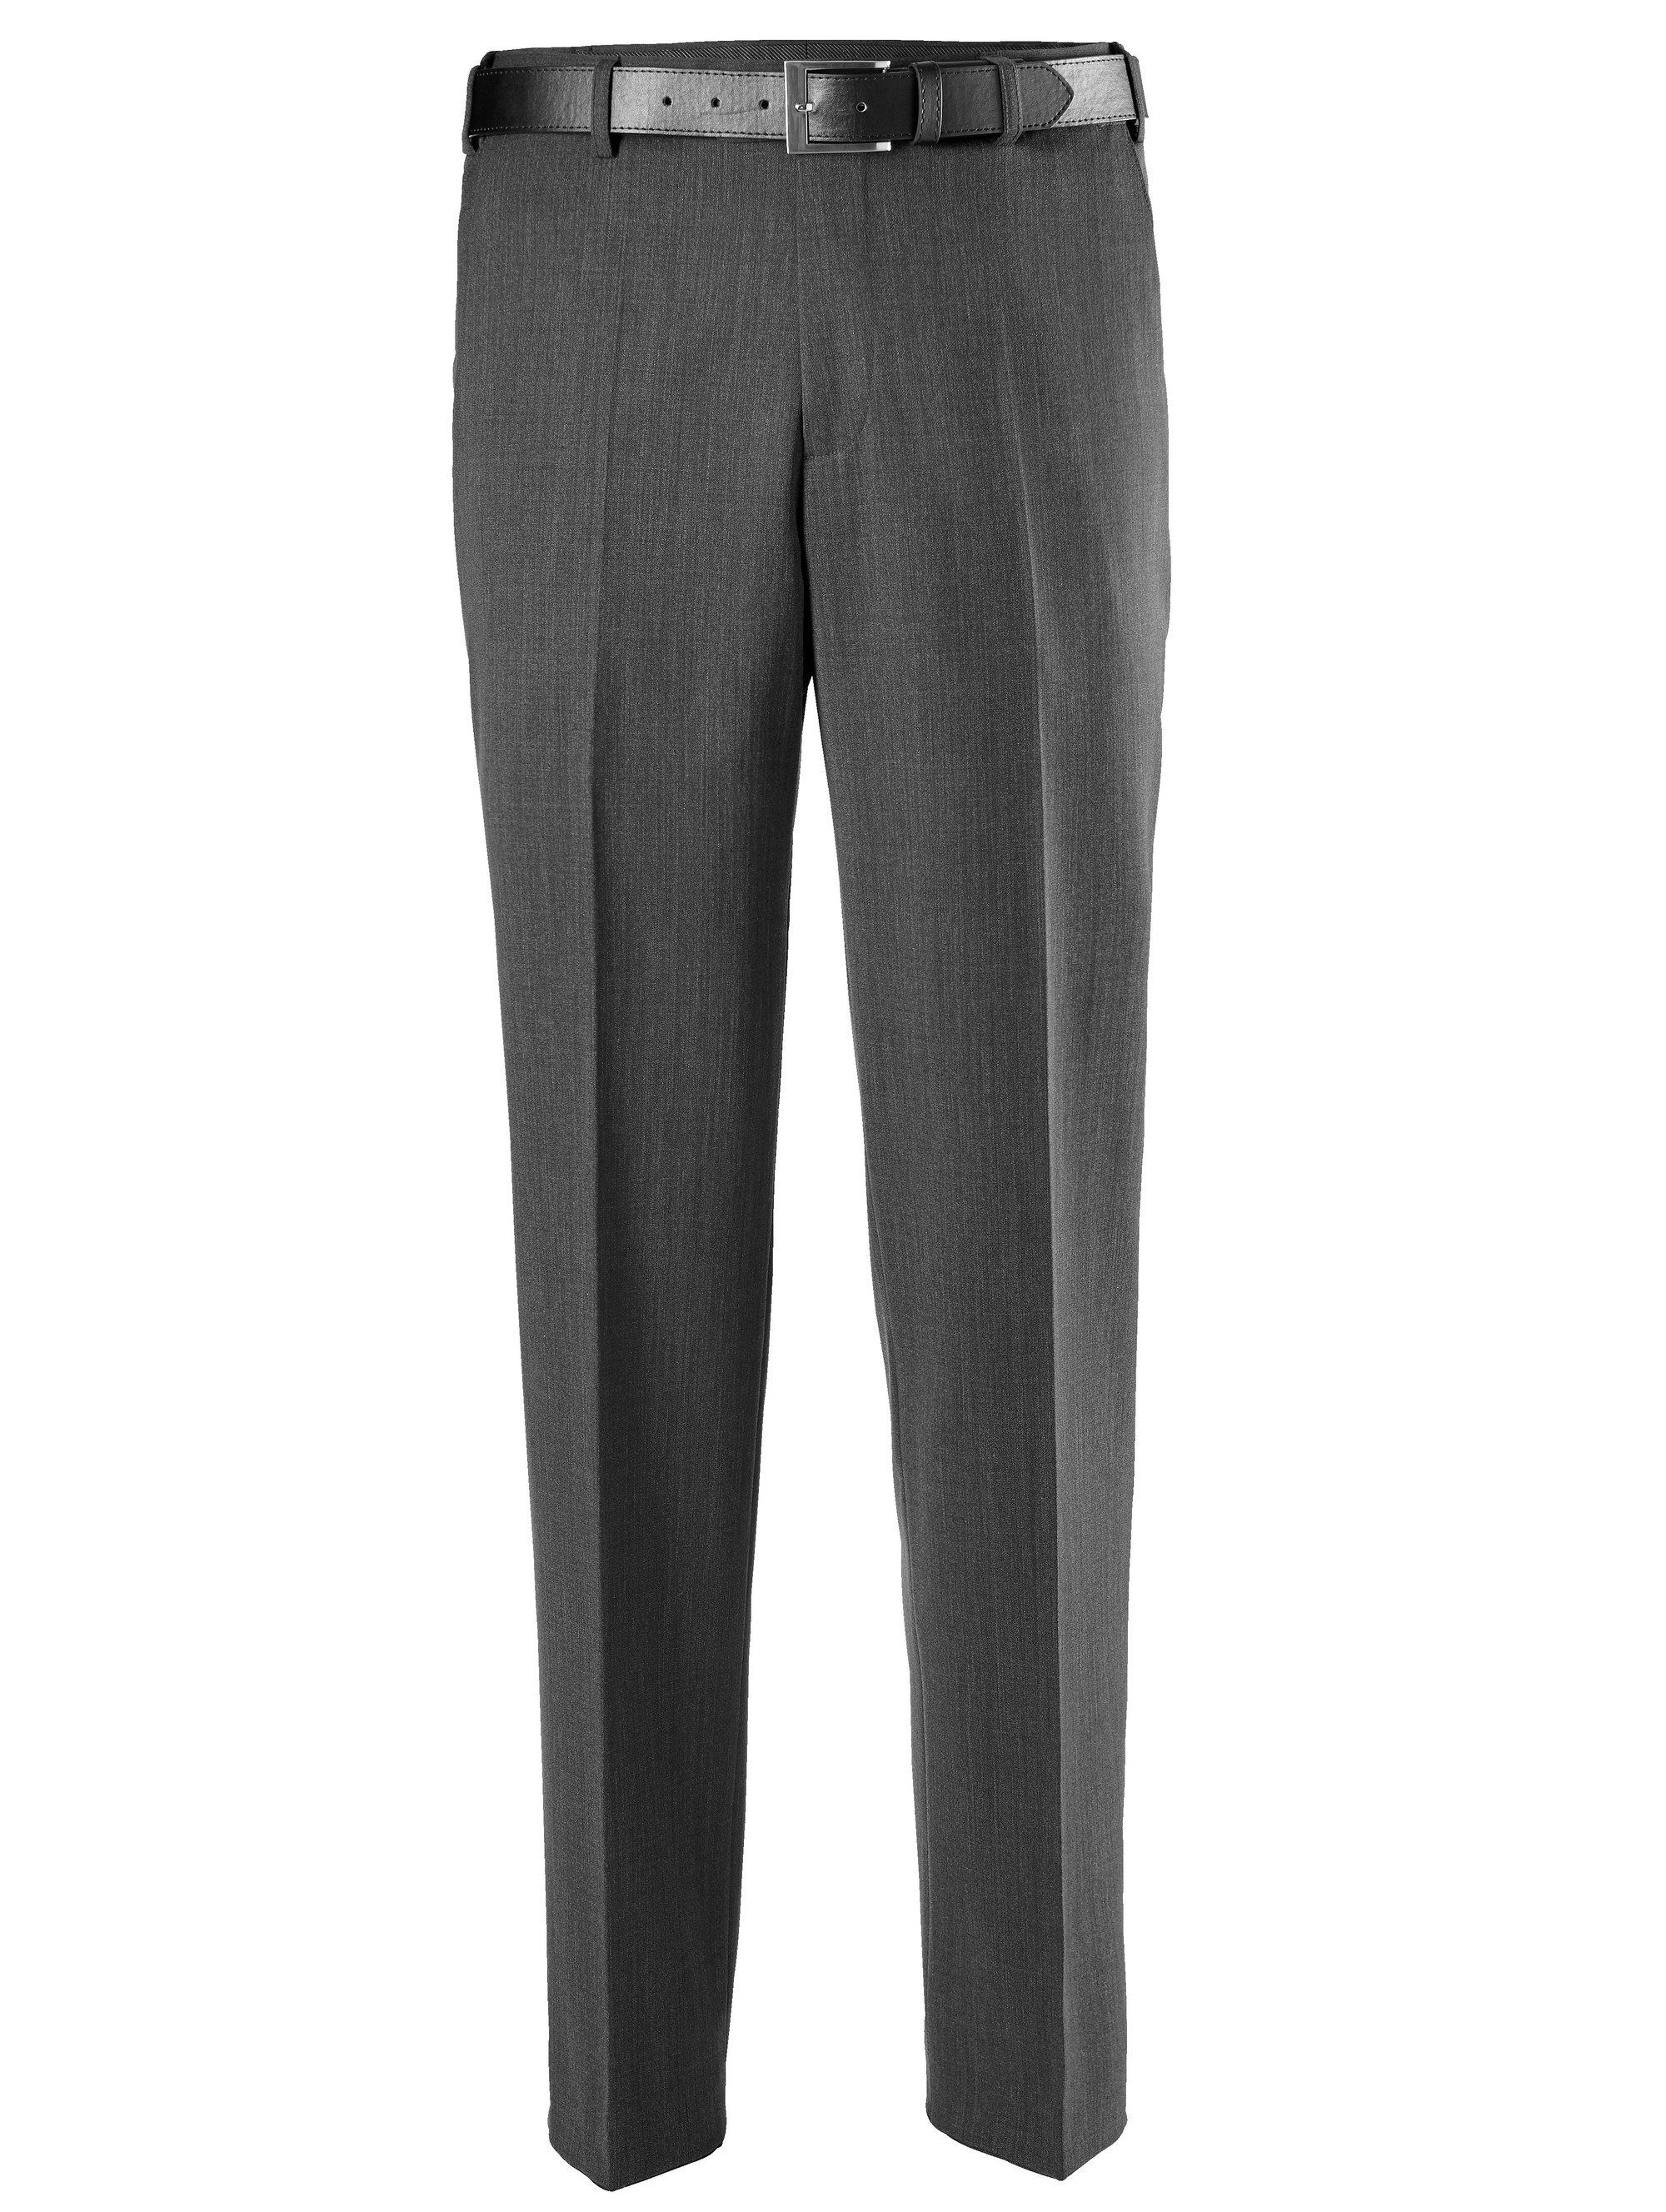 Men Plus by Happy Size Hose mit Gürtel | Bekleidung > Hosen > Sonstige Hosen | Grau | Polyester - Wolle | MEN PLUS BY HAPPY SIZE